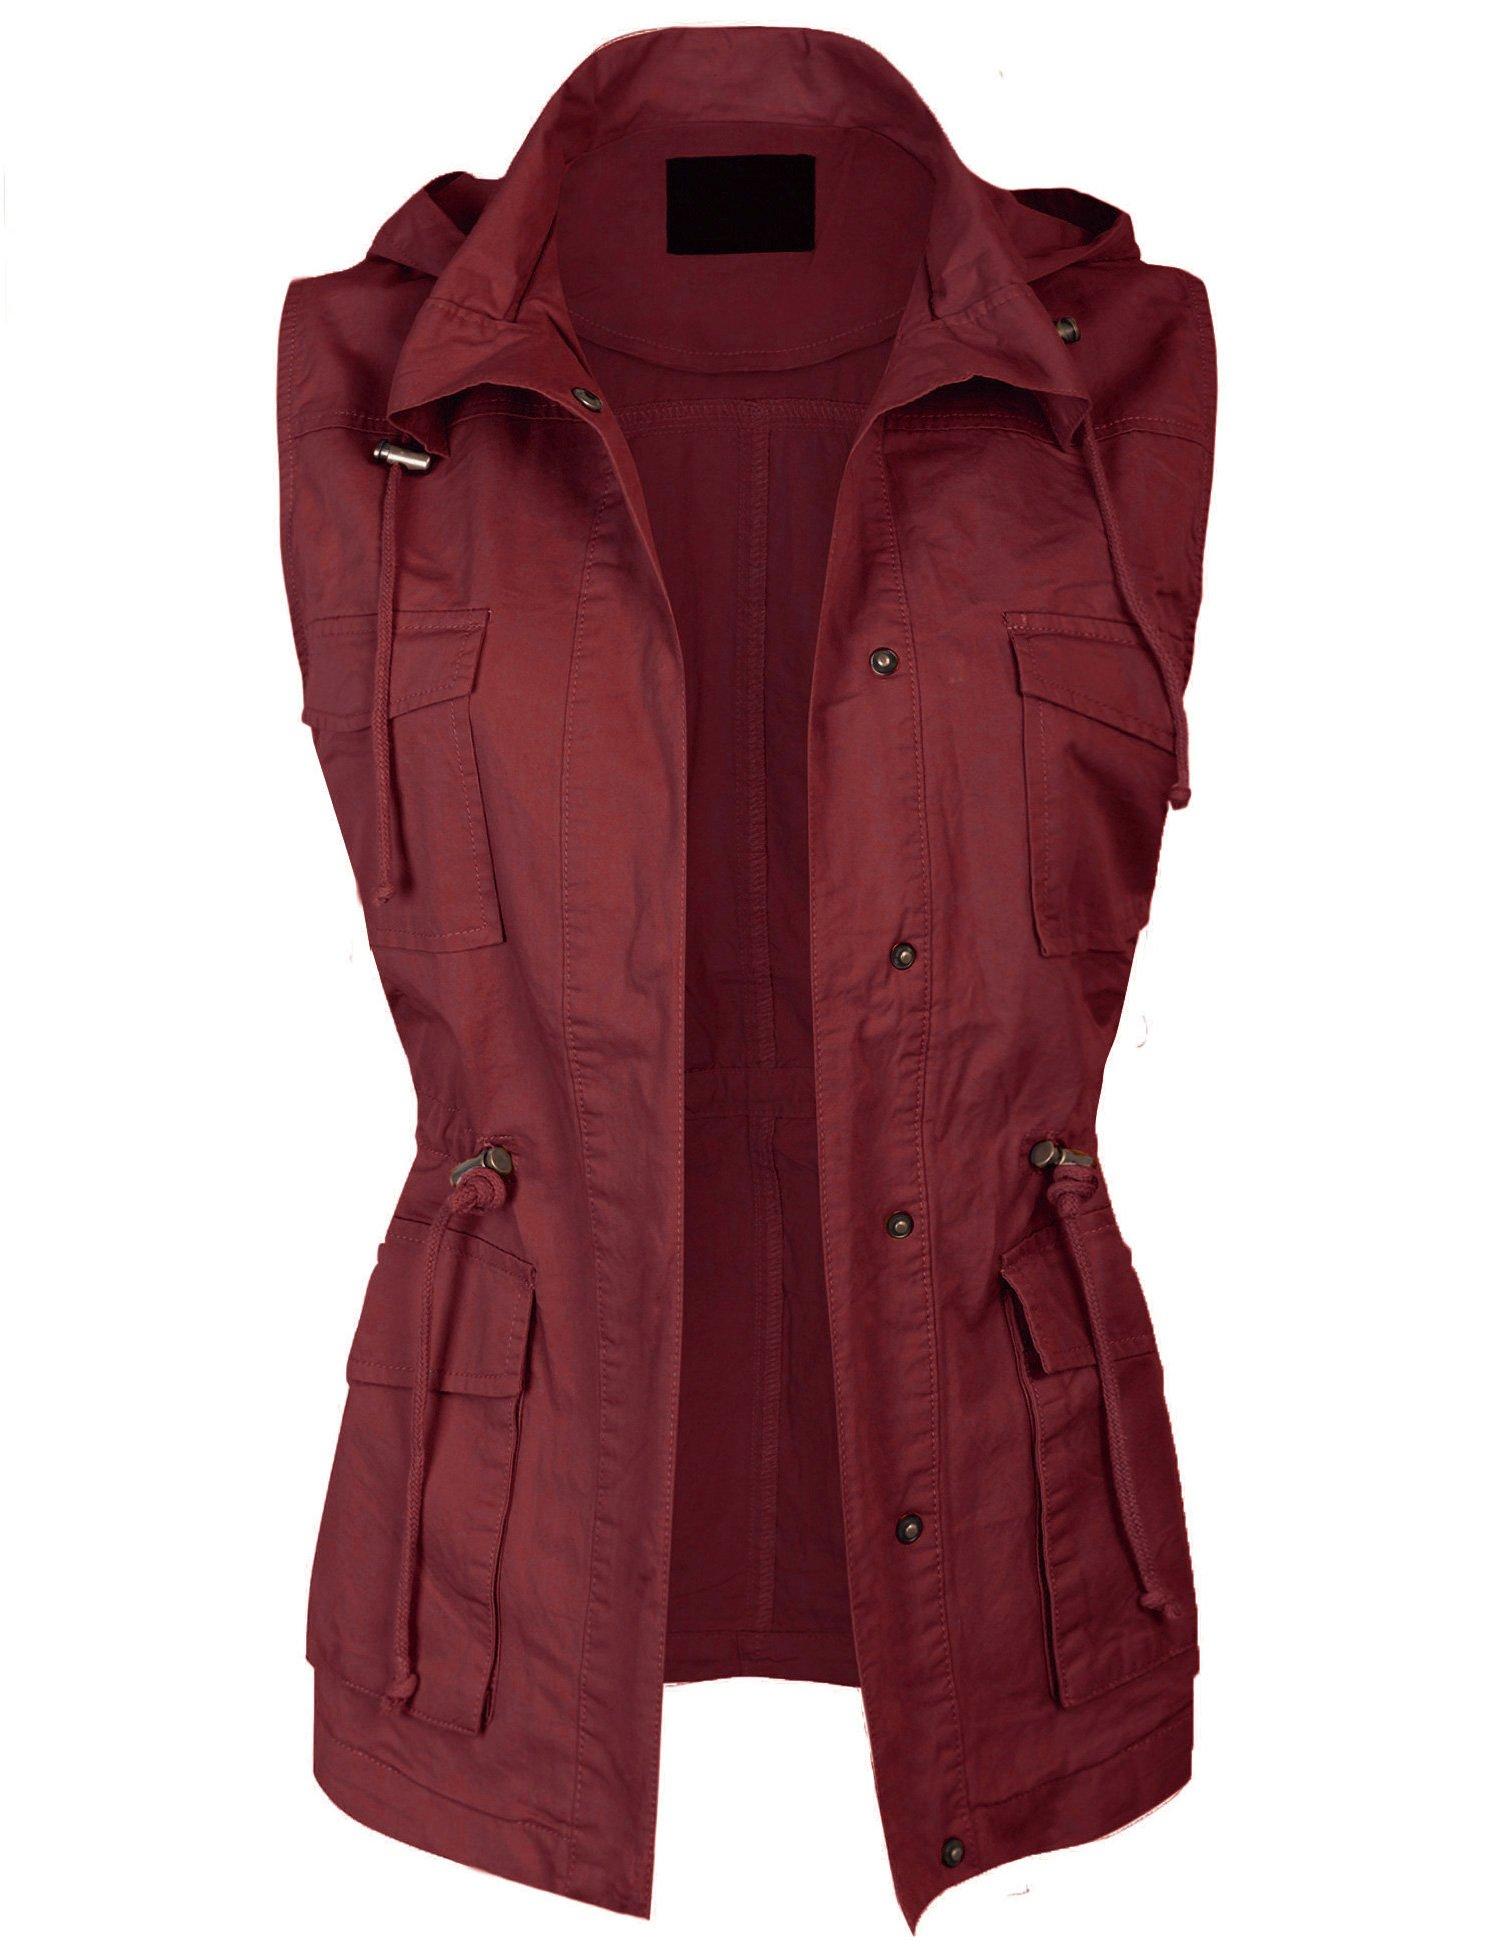 KOGMO Womens Military Anorak Safari Utility Vest with Hood-3X-WINE by KOGMO (Image #4)